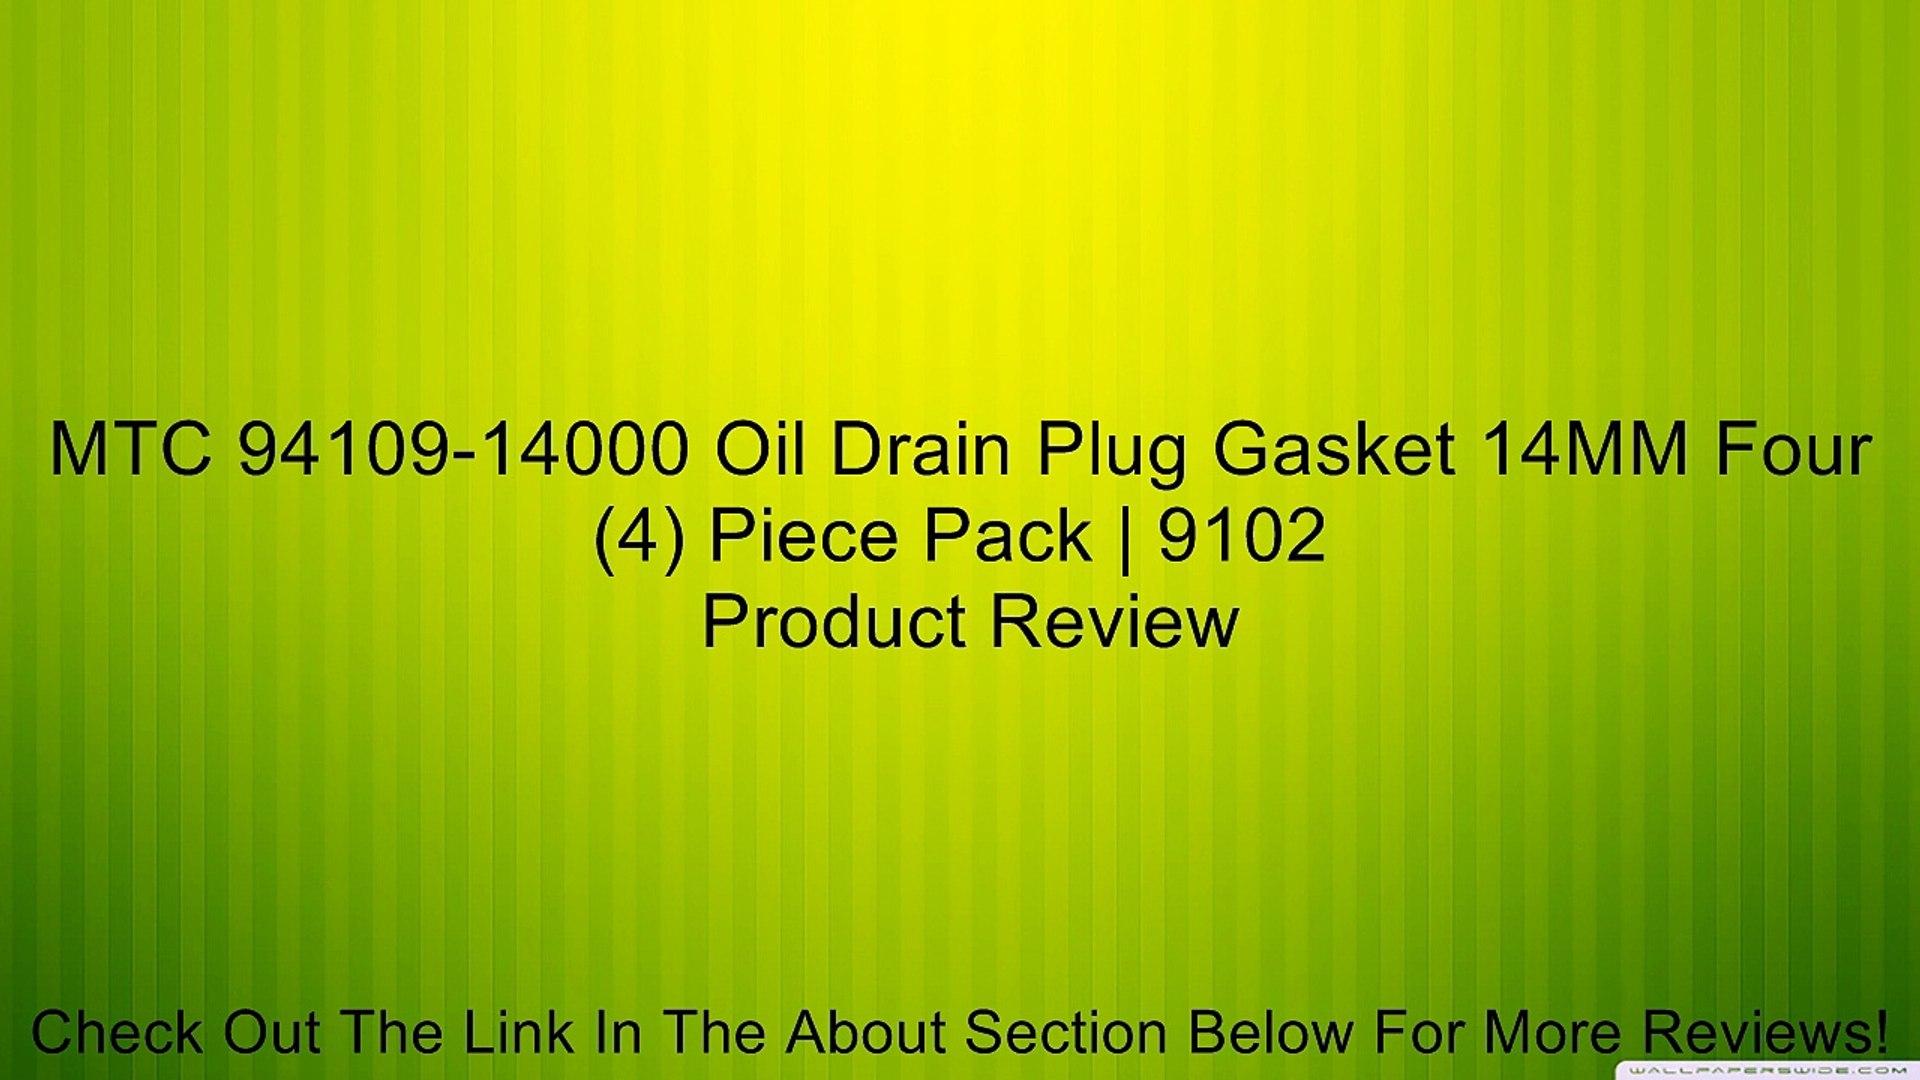 Mopar MD000312 Engine Oil Drain Plug Gasket